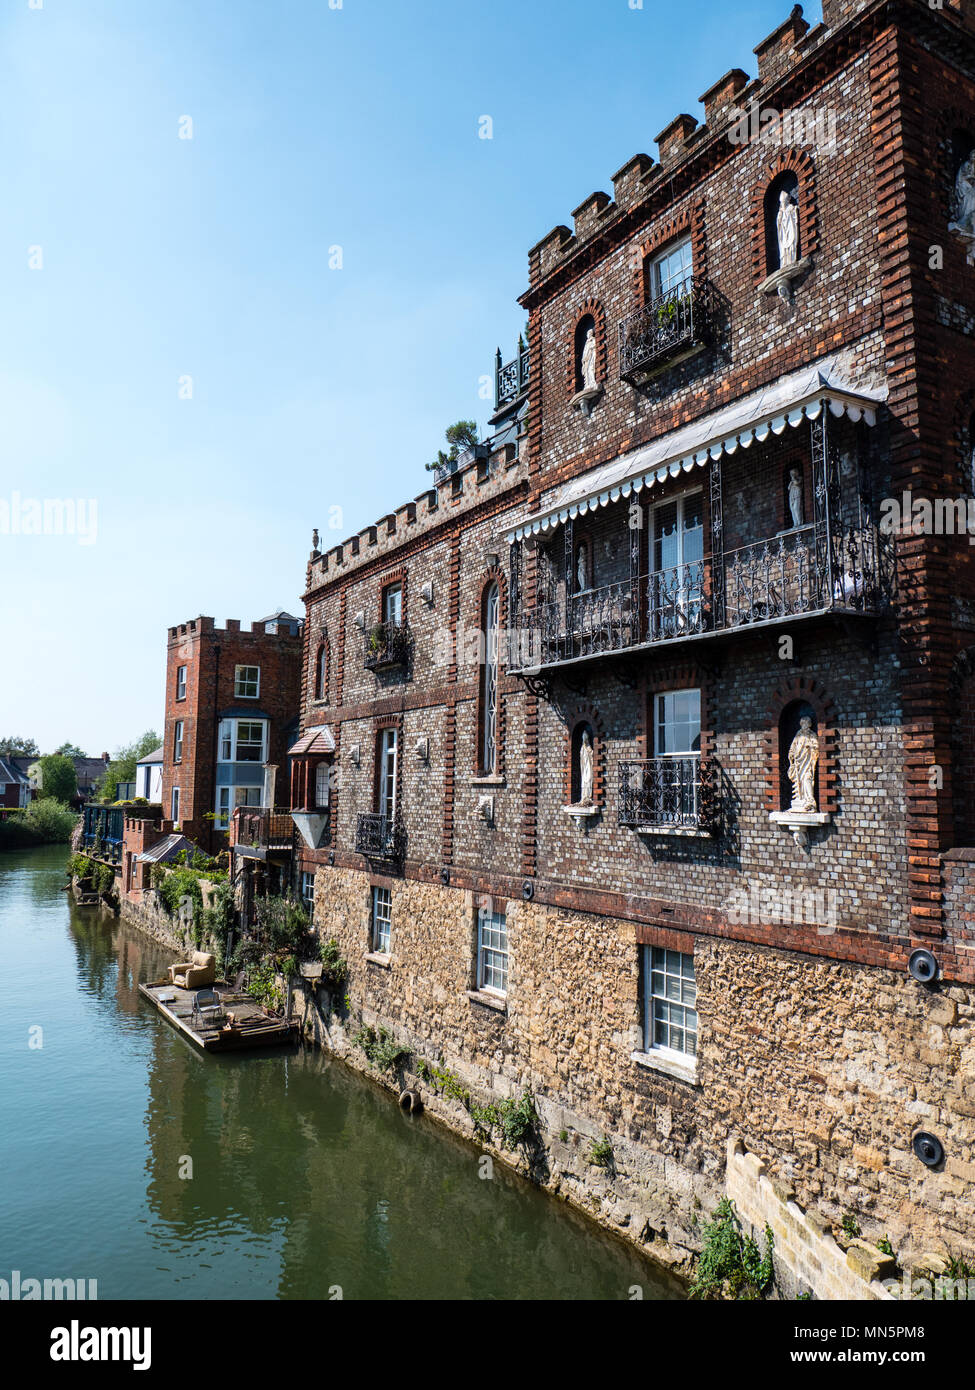 Houses on River Thames nr Folly Bridge, Oxford, Oxfordshire, England, UK, GB. Stock Photo